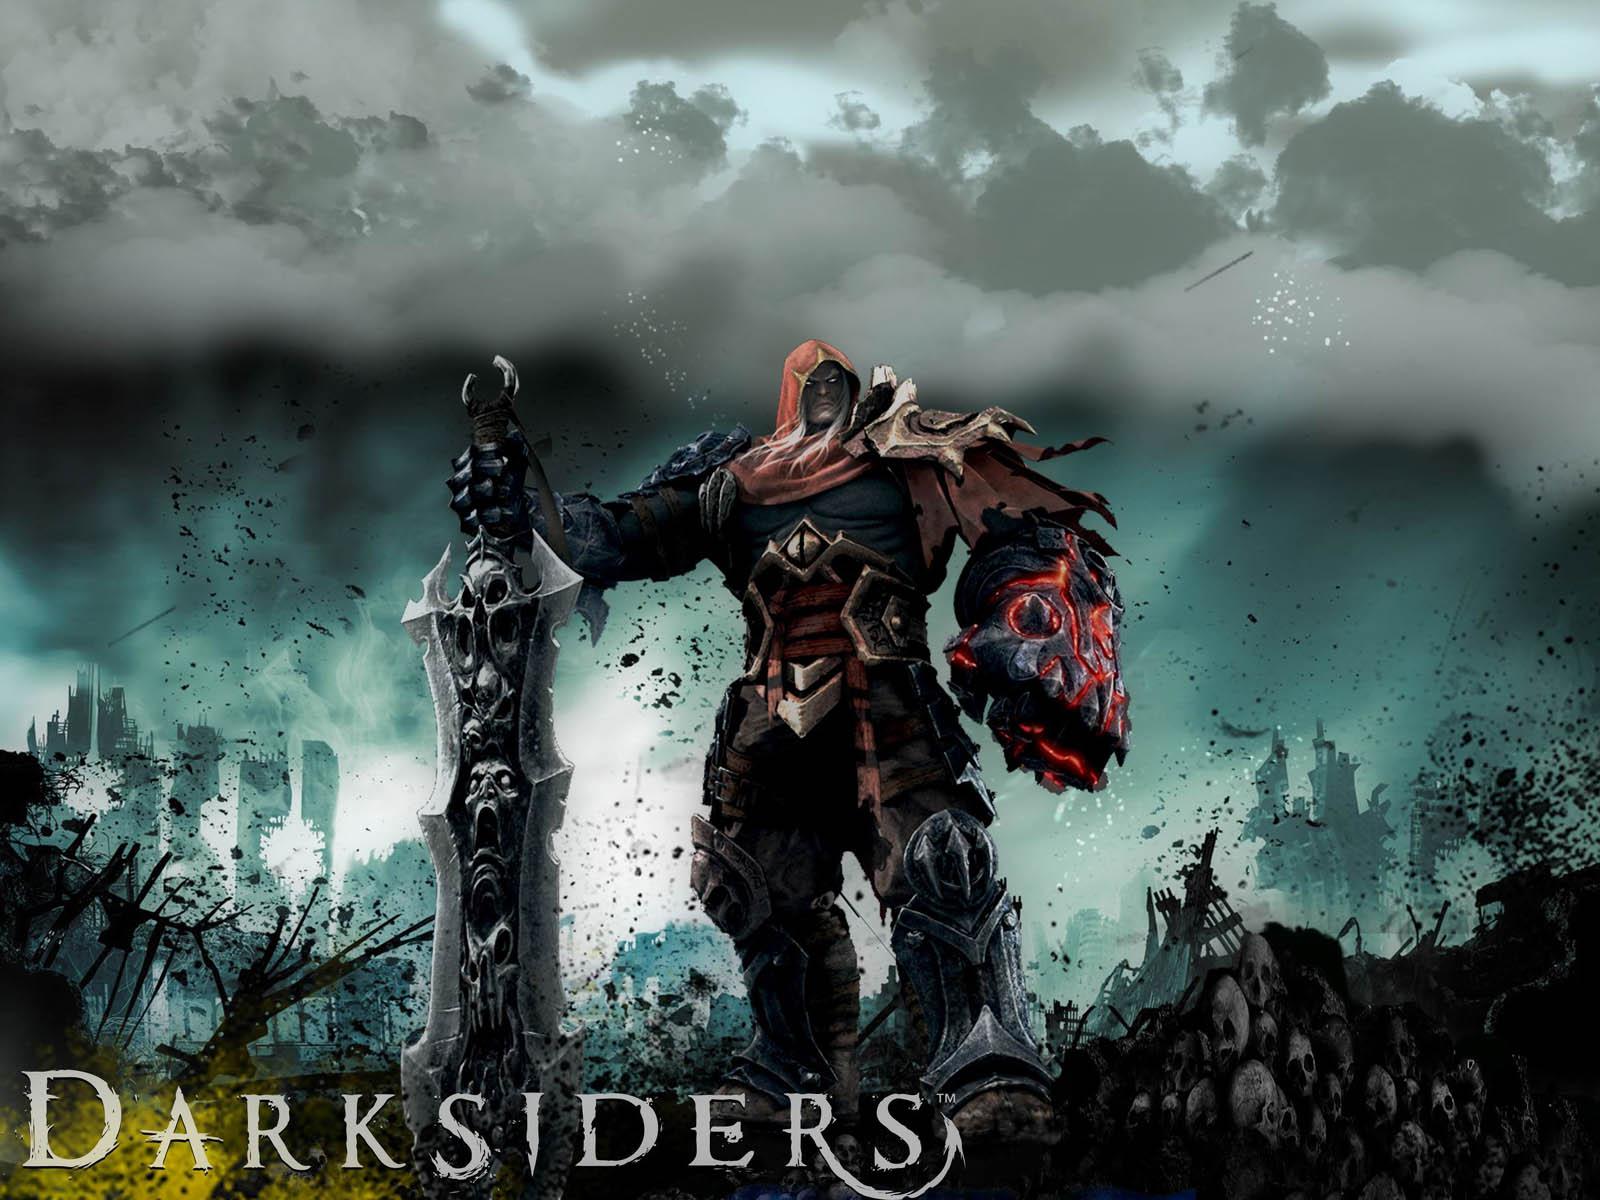 wallpaper: Darksiders Game Wallpapers